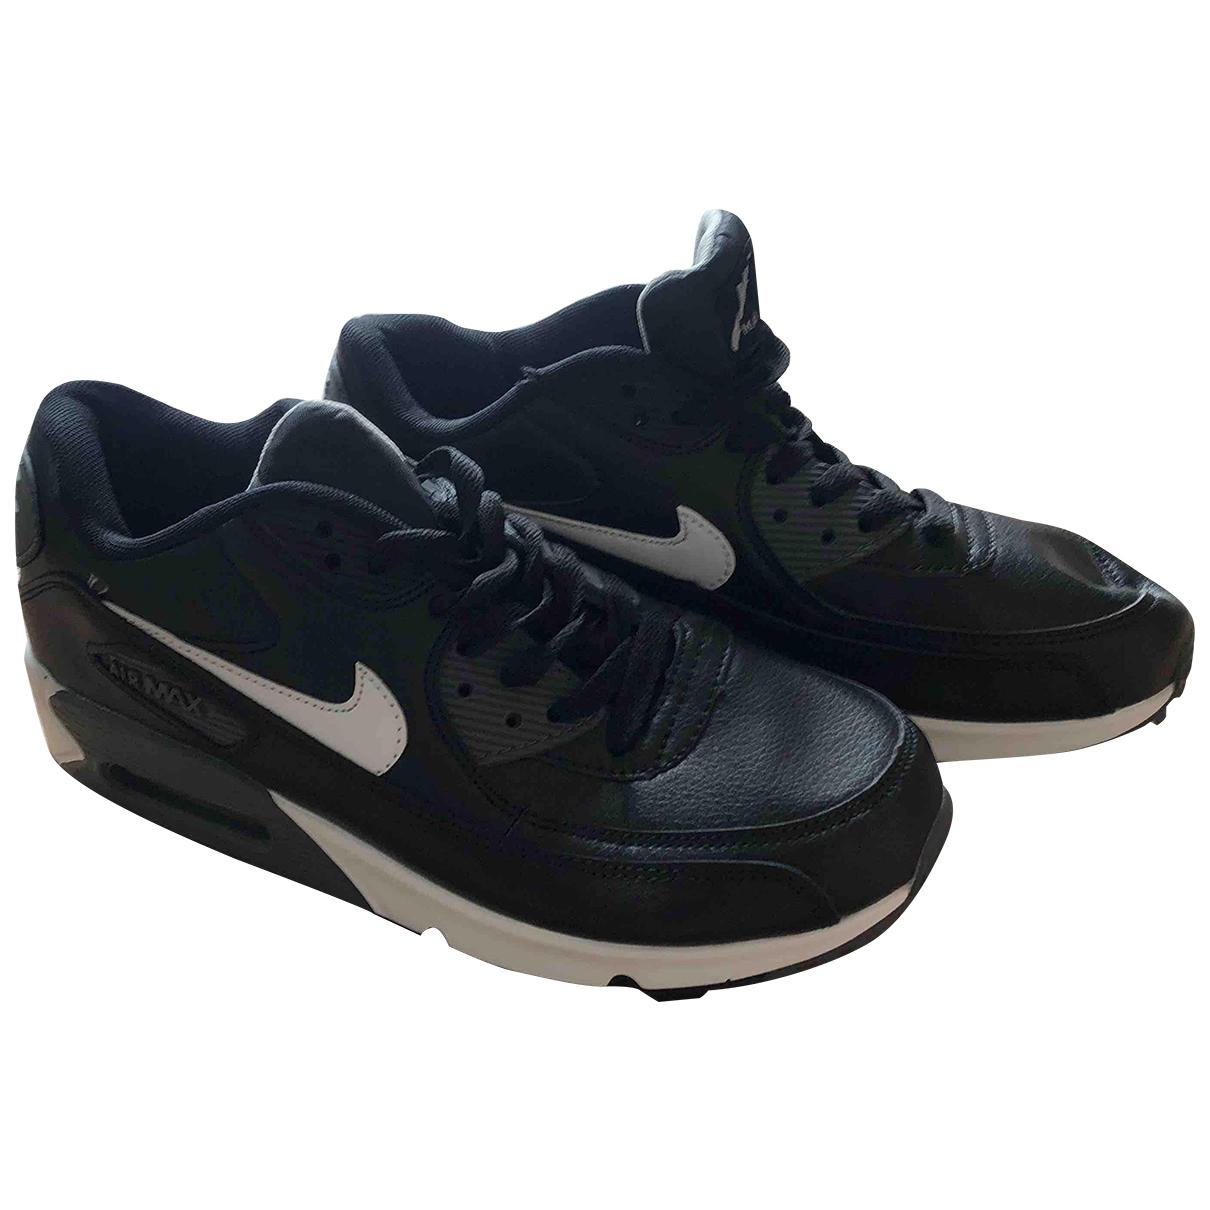 Nike - Baskets Air Max 90 pour homme en cuir - noir